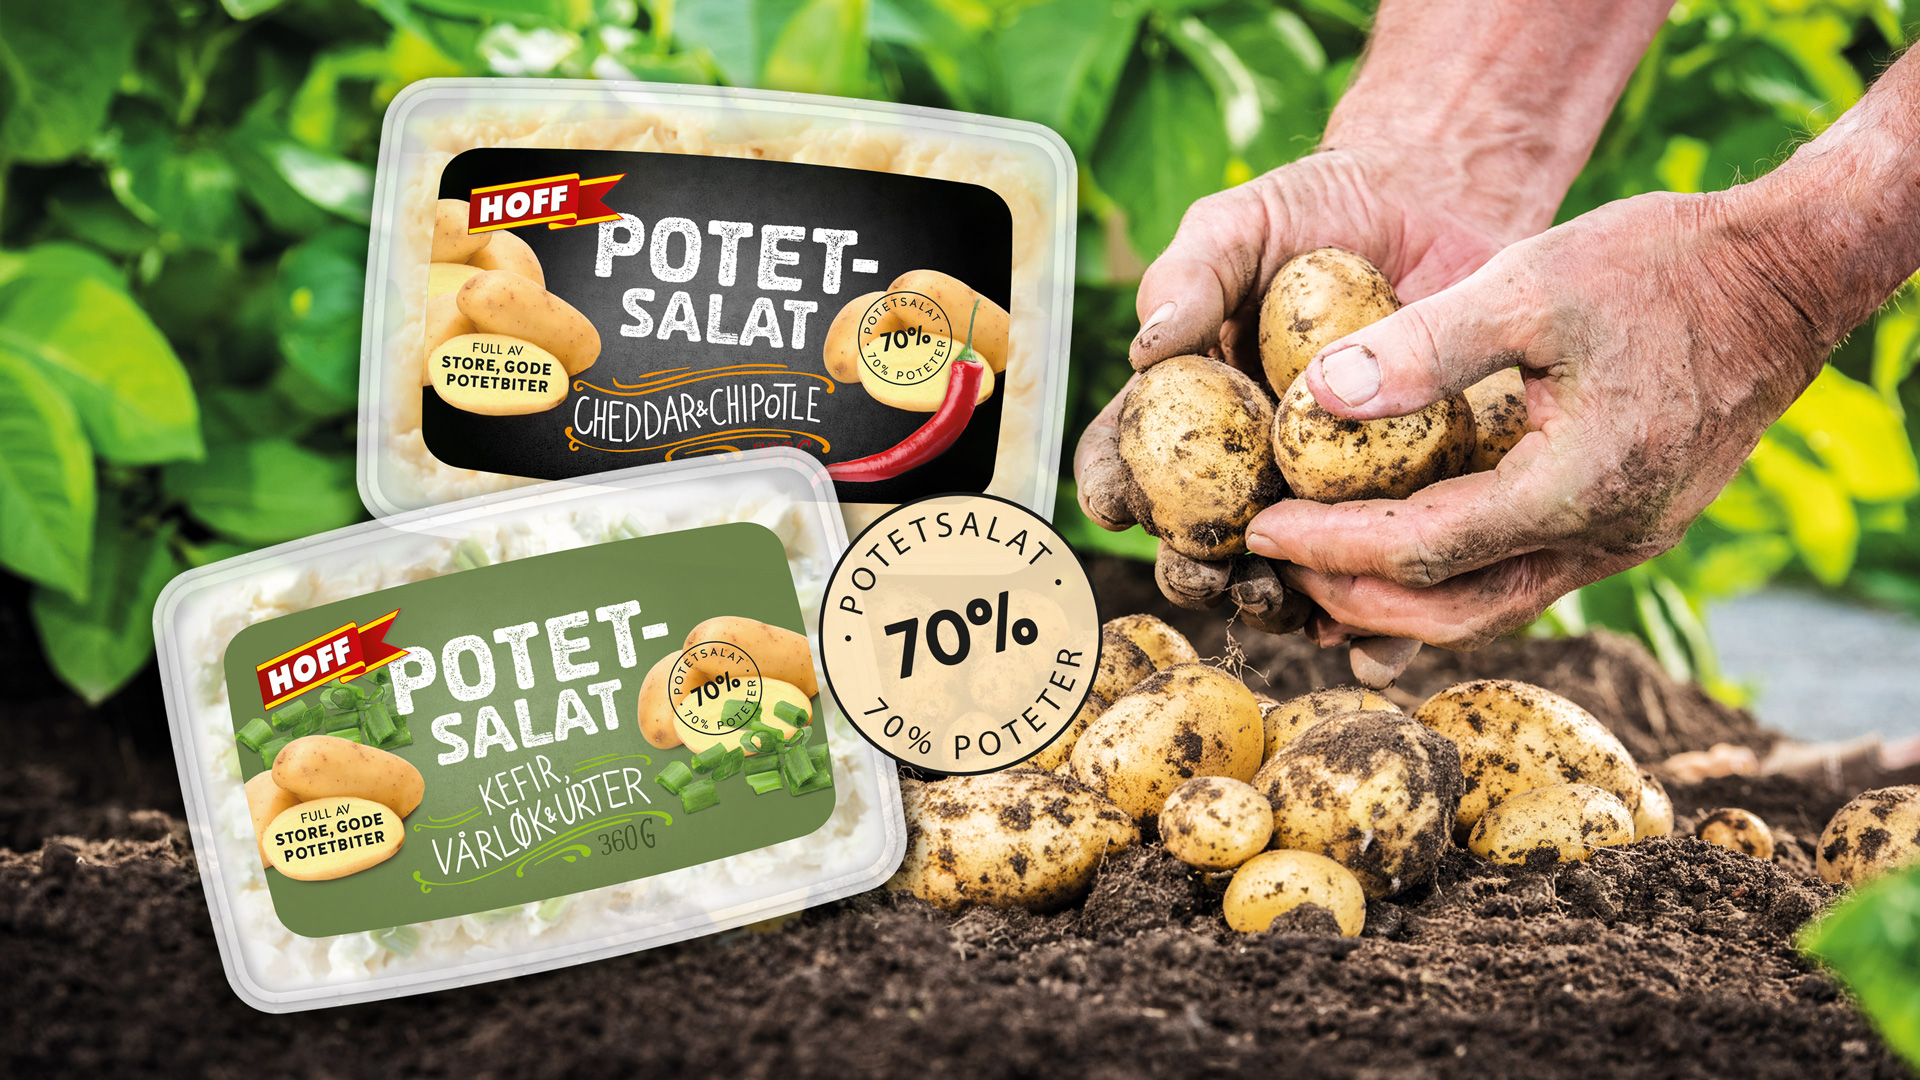 Hoff poteter